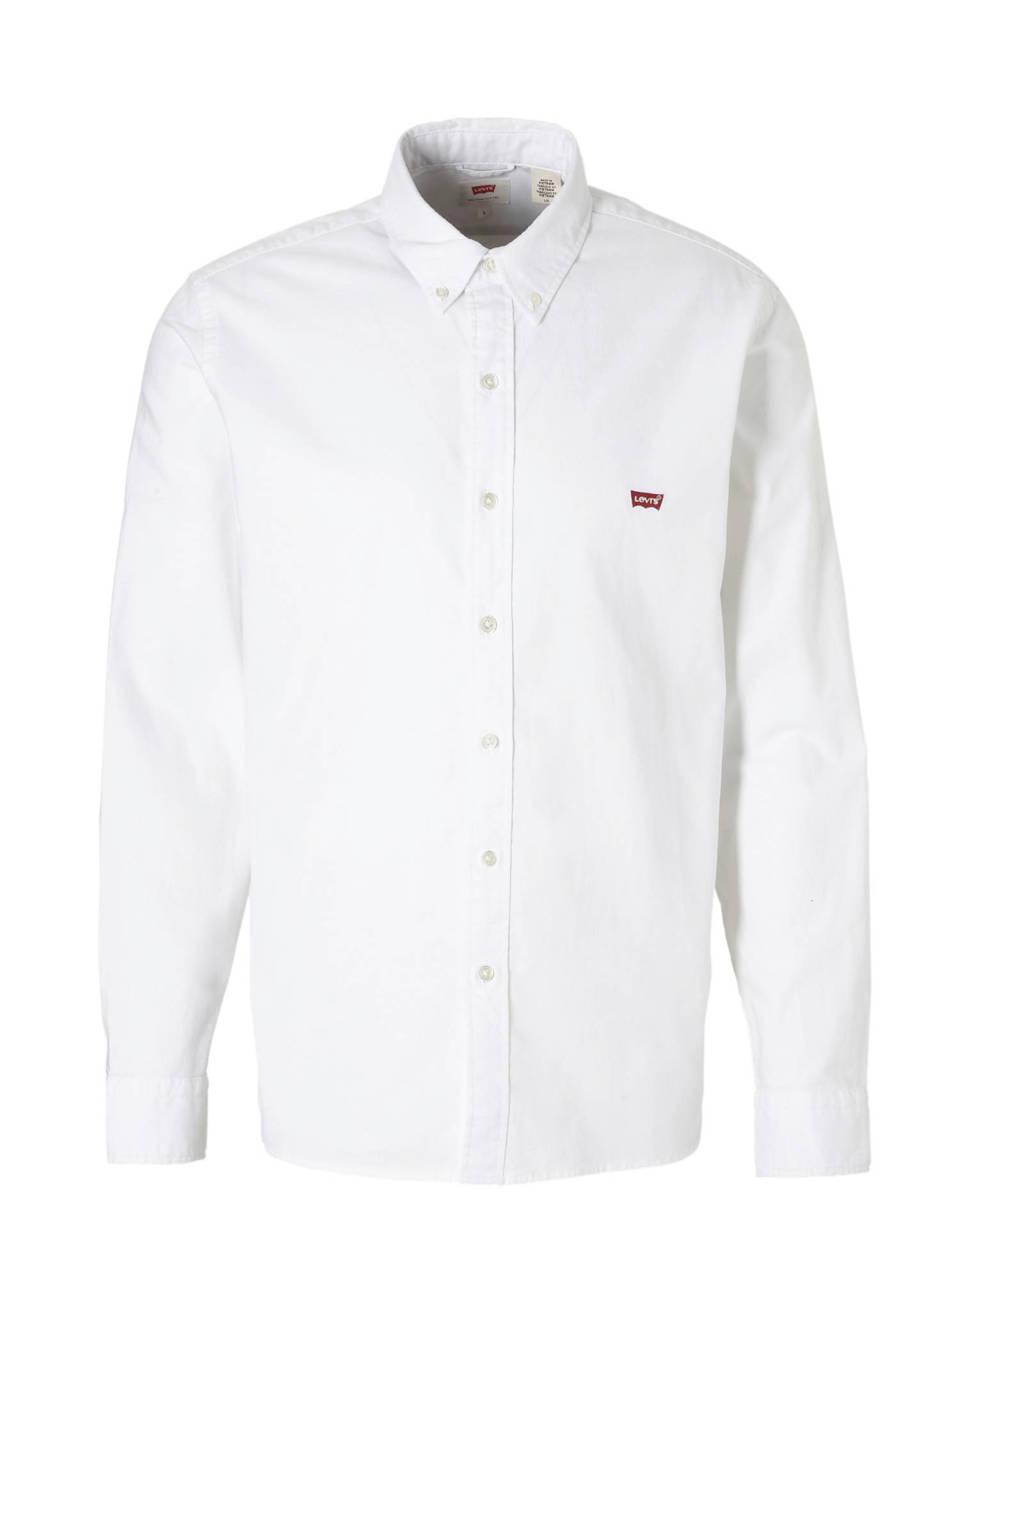 Levi's overhemd, Wit